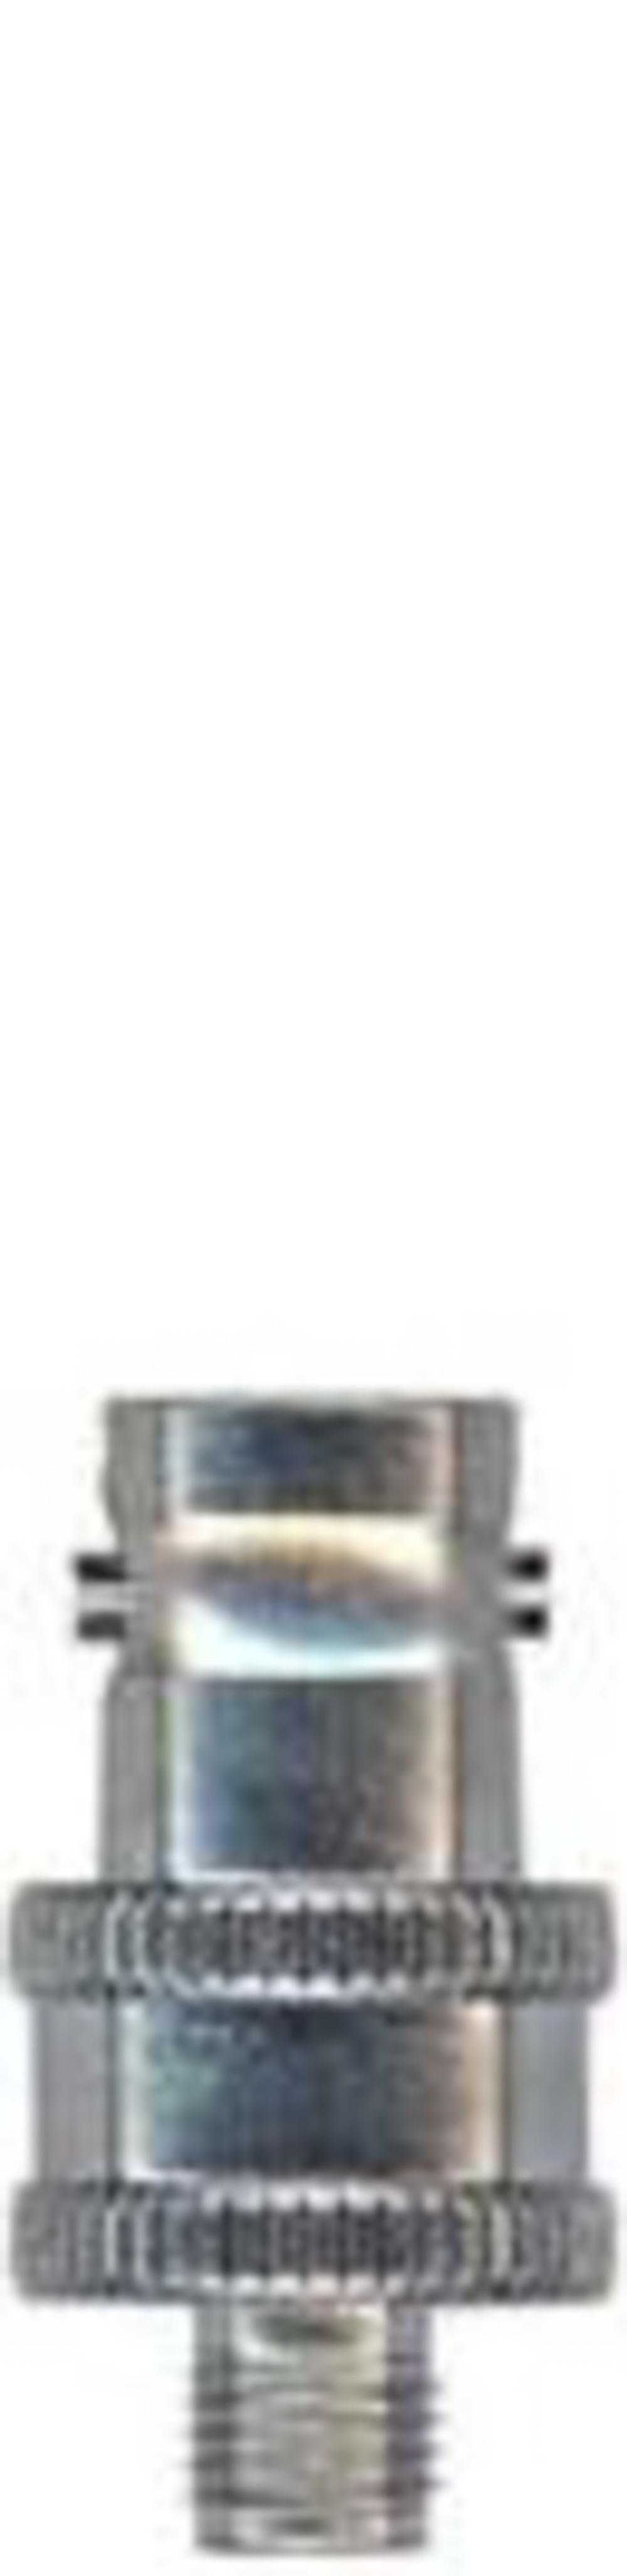 Racing Electronics Antenna Adapter Kenwood Reliant